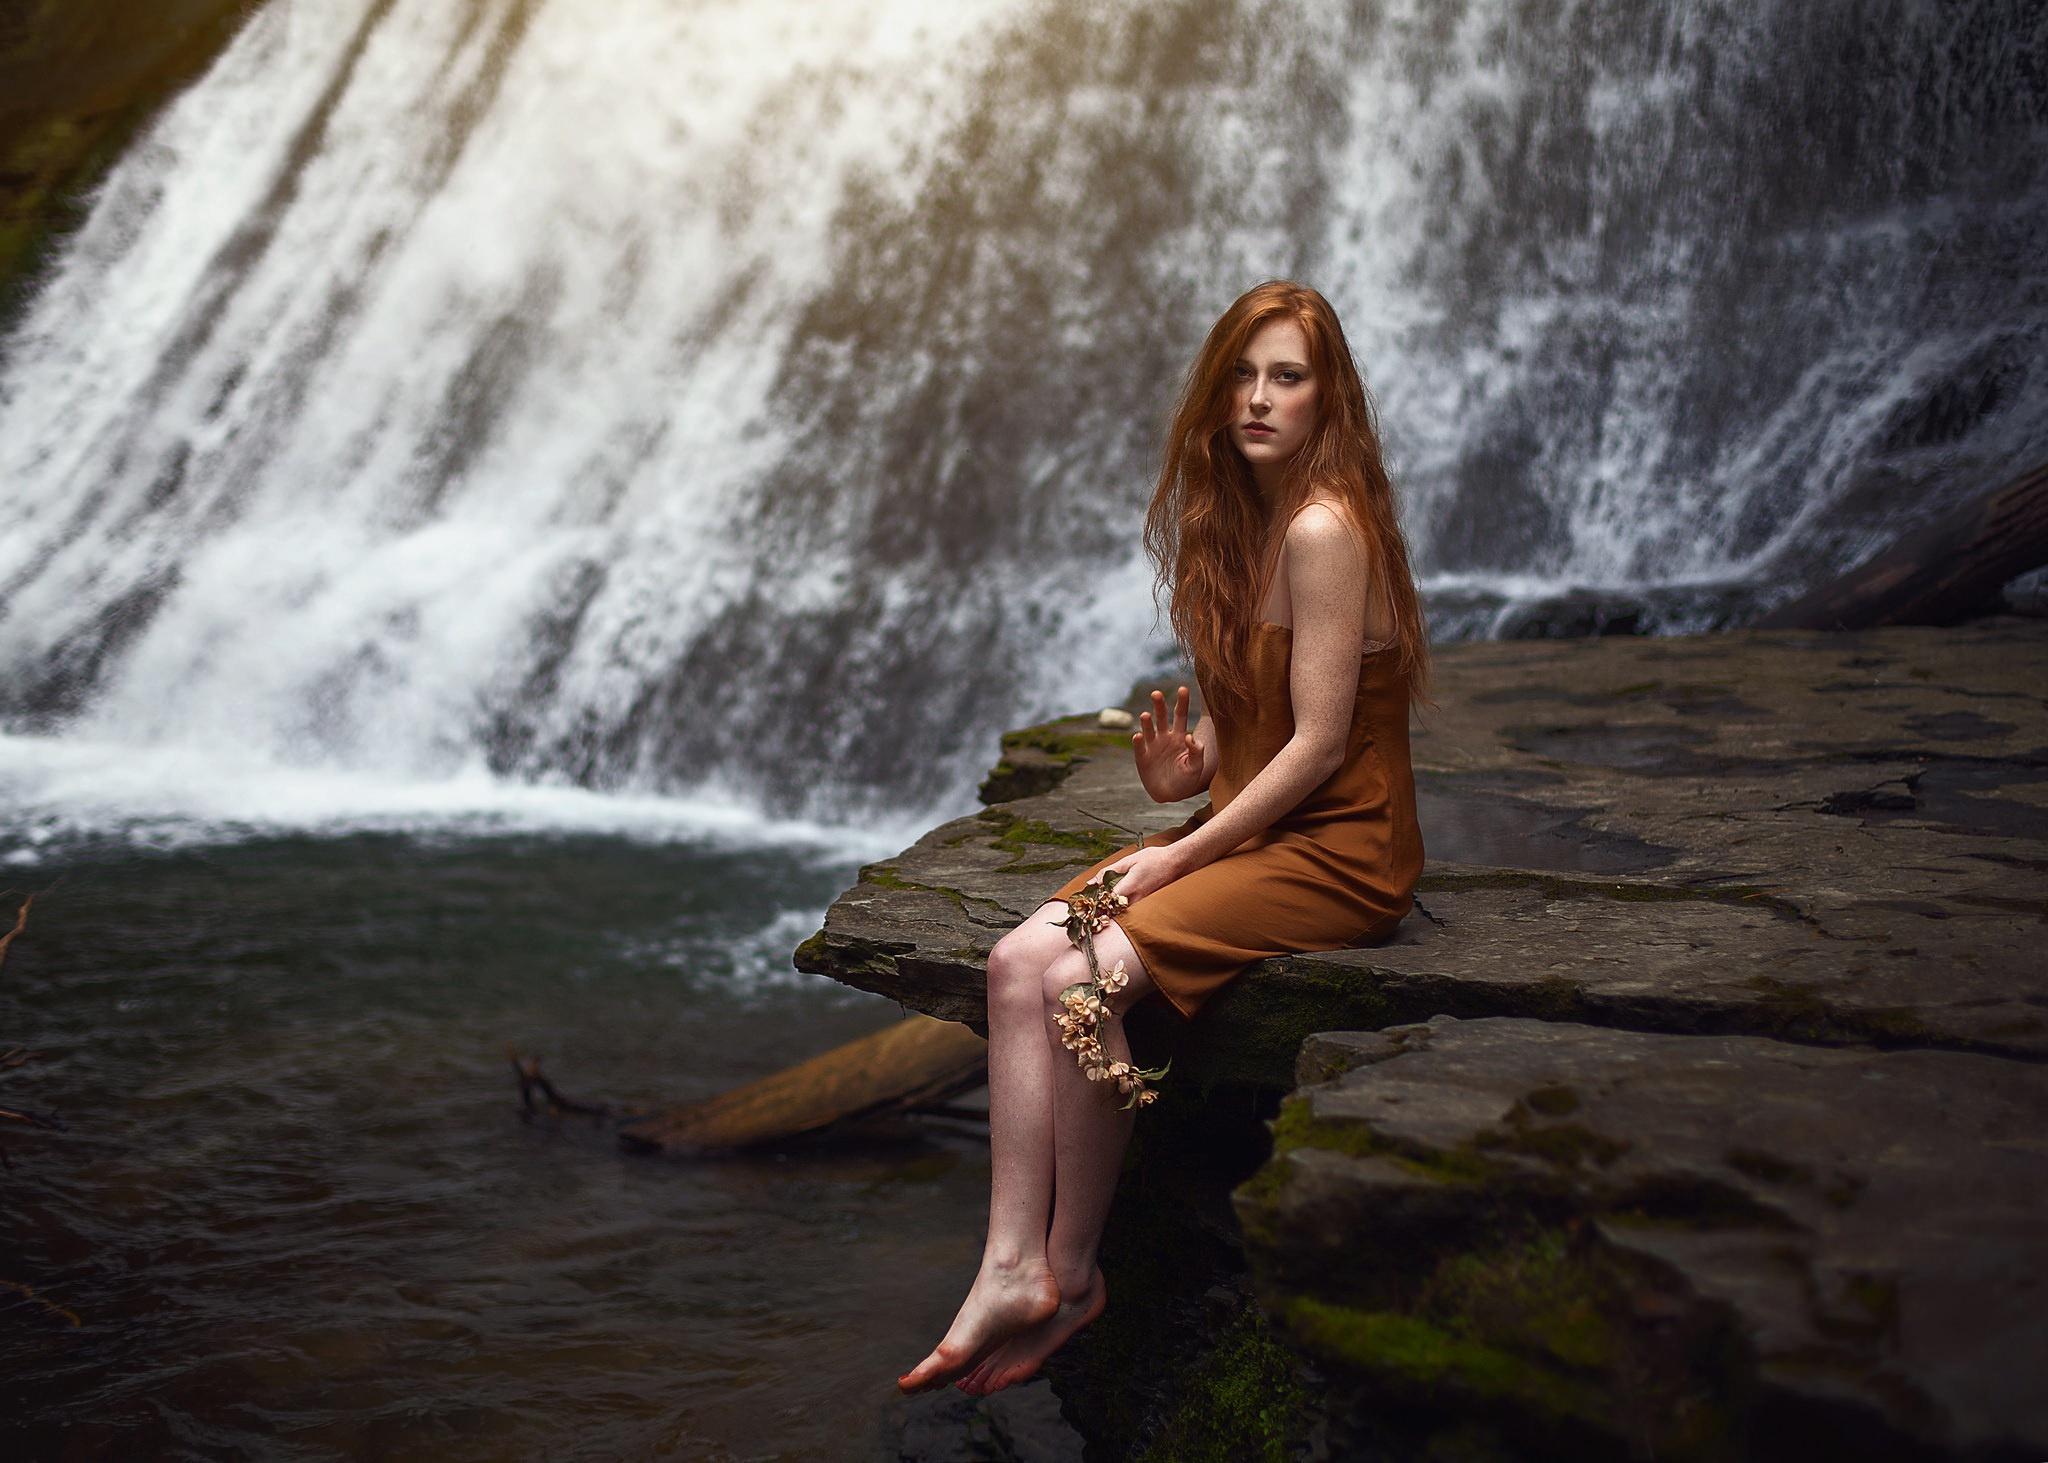 рыжая девушка возле водопада снова забилась